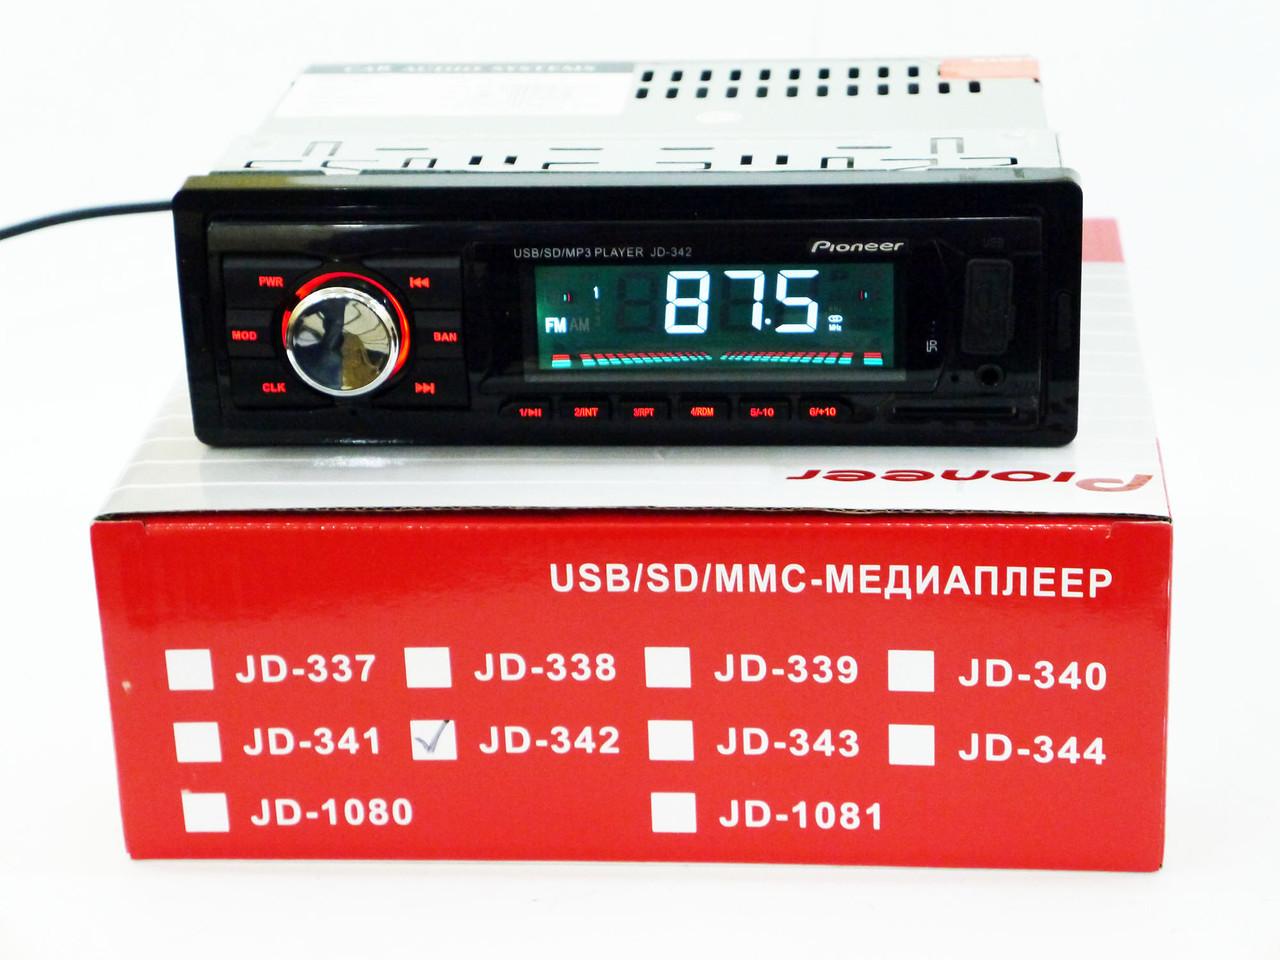 Автомагнитола Pioneer JD-342 ISO Usb+Sd+Fm+Aux+ пульт (4x50W)